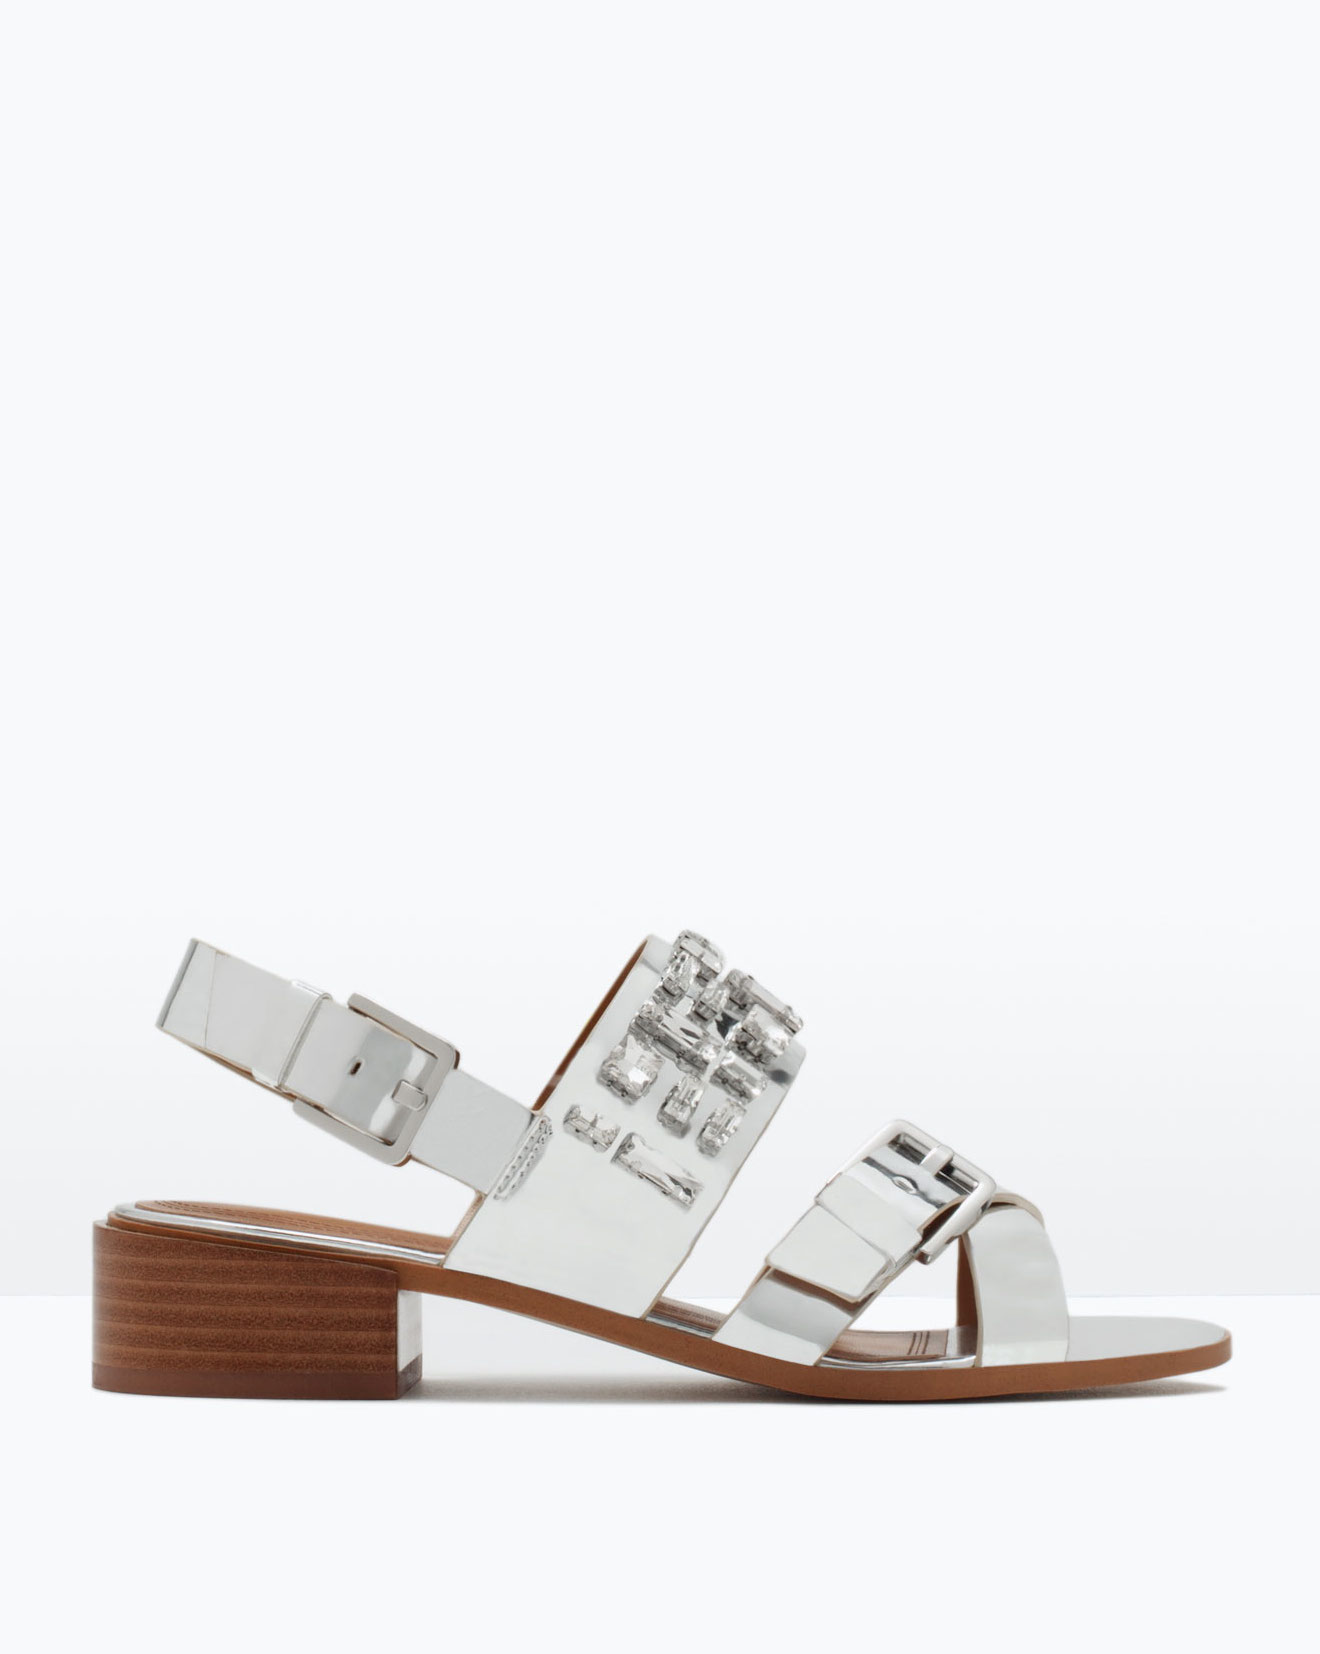 Zara - sandales (40€ au lieu de 60€)